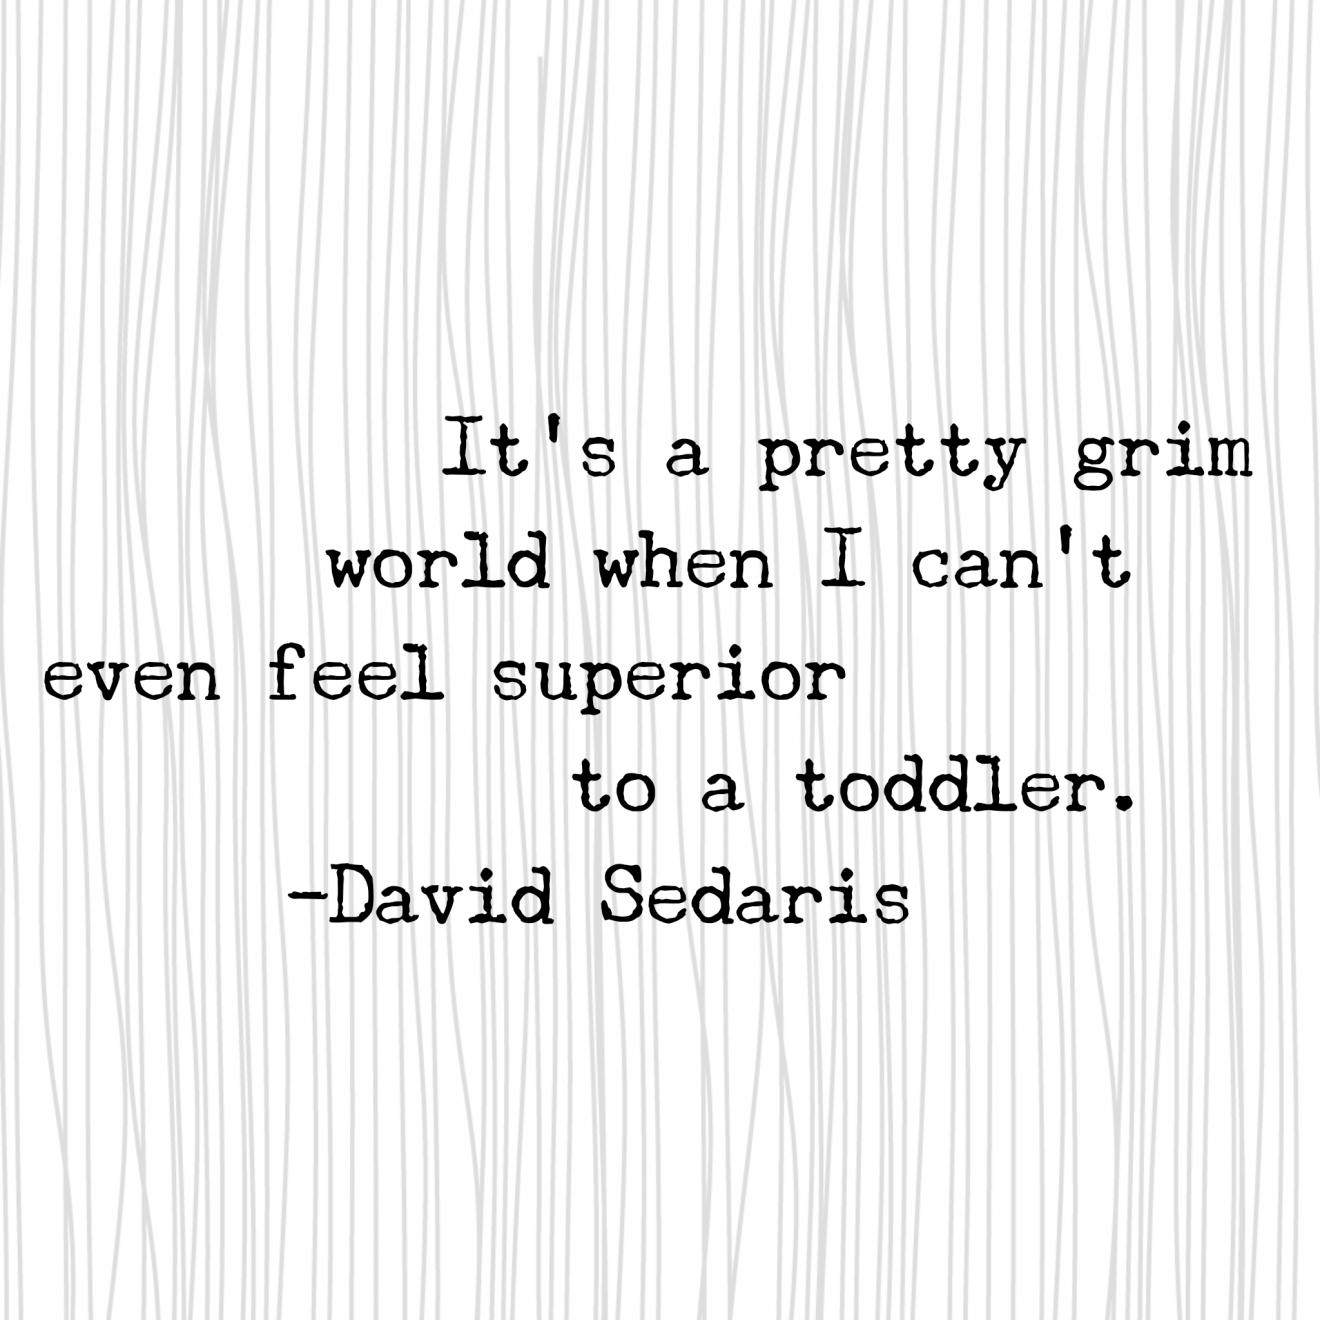 12 Quotes From David Sedaris In 2020 David Sedaris Quotes David